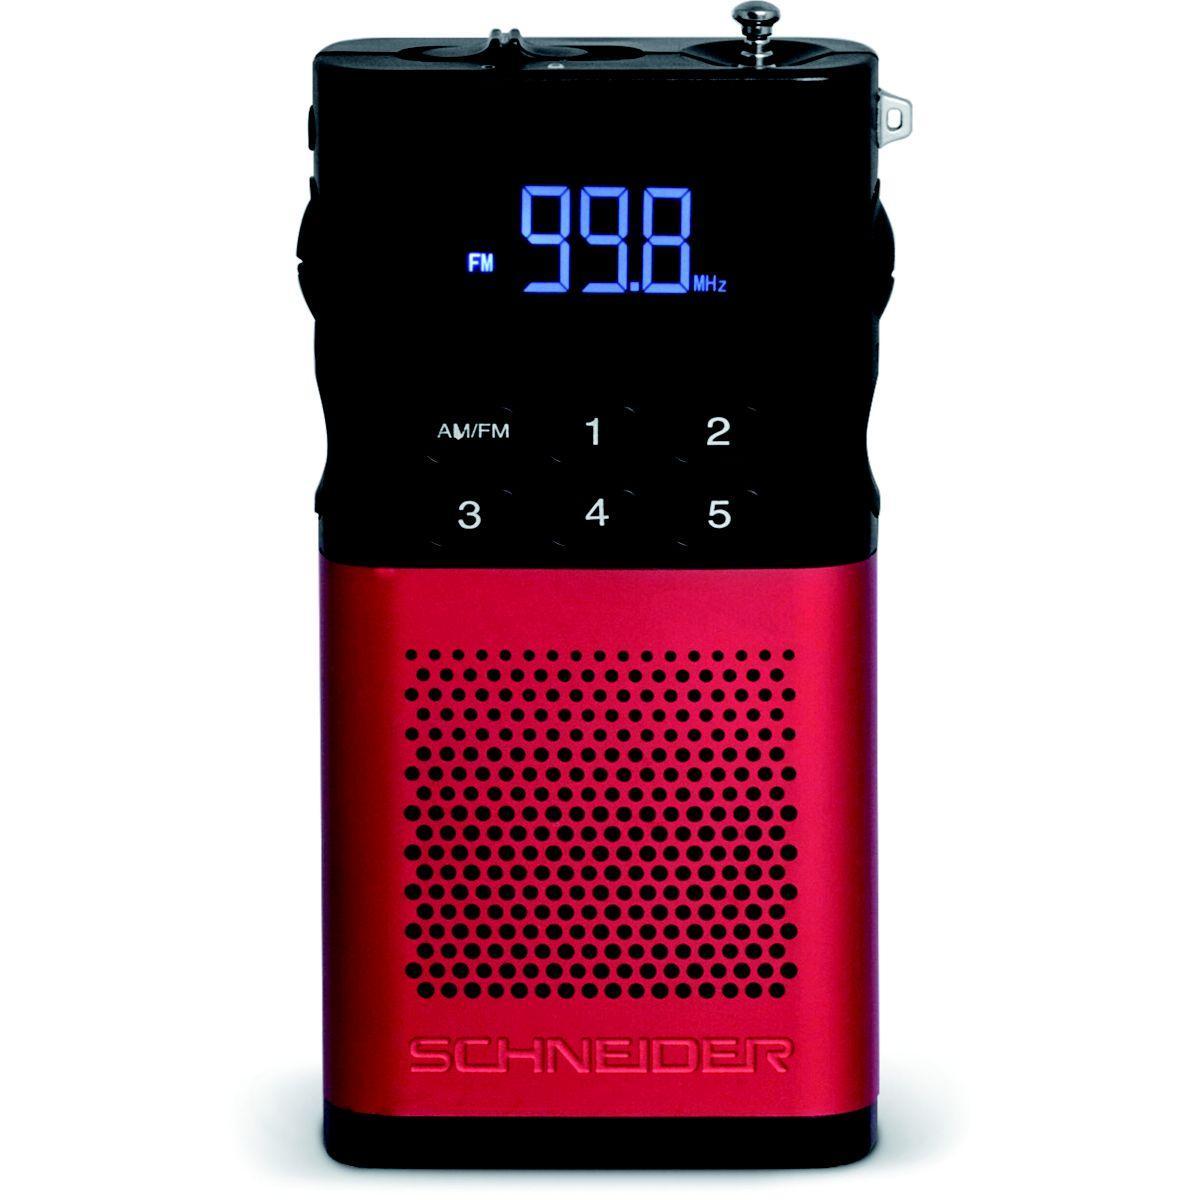 Radio analogique schneider piccolo rouge - 2% de remise imm?di...